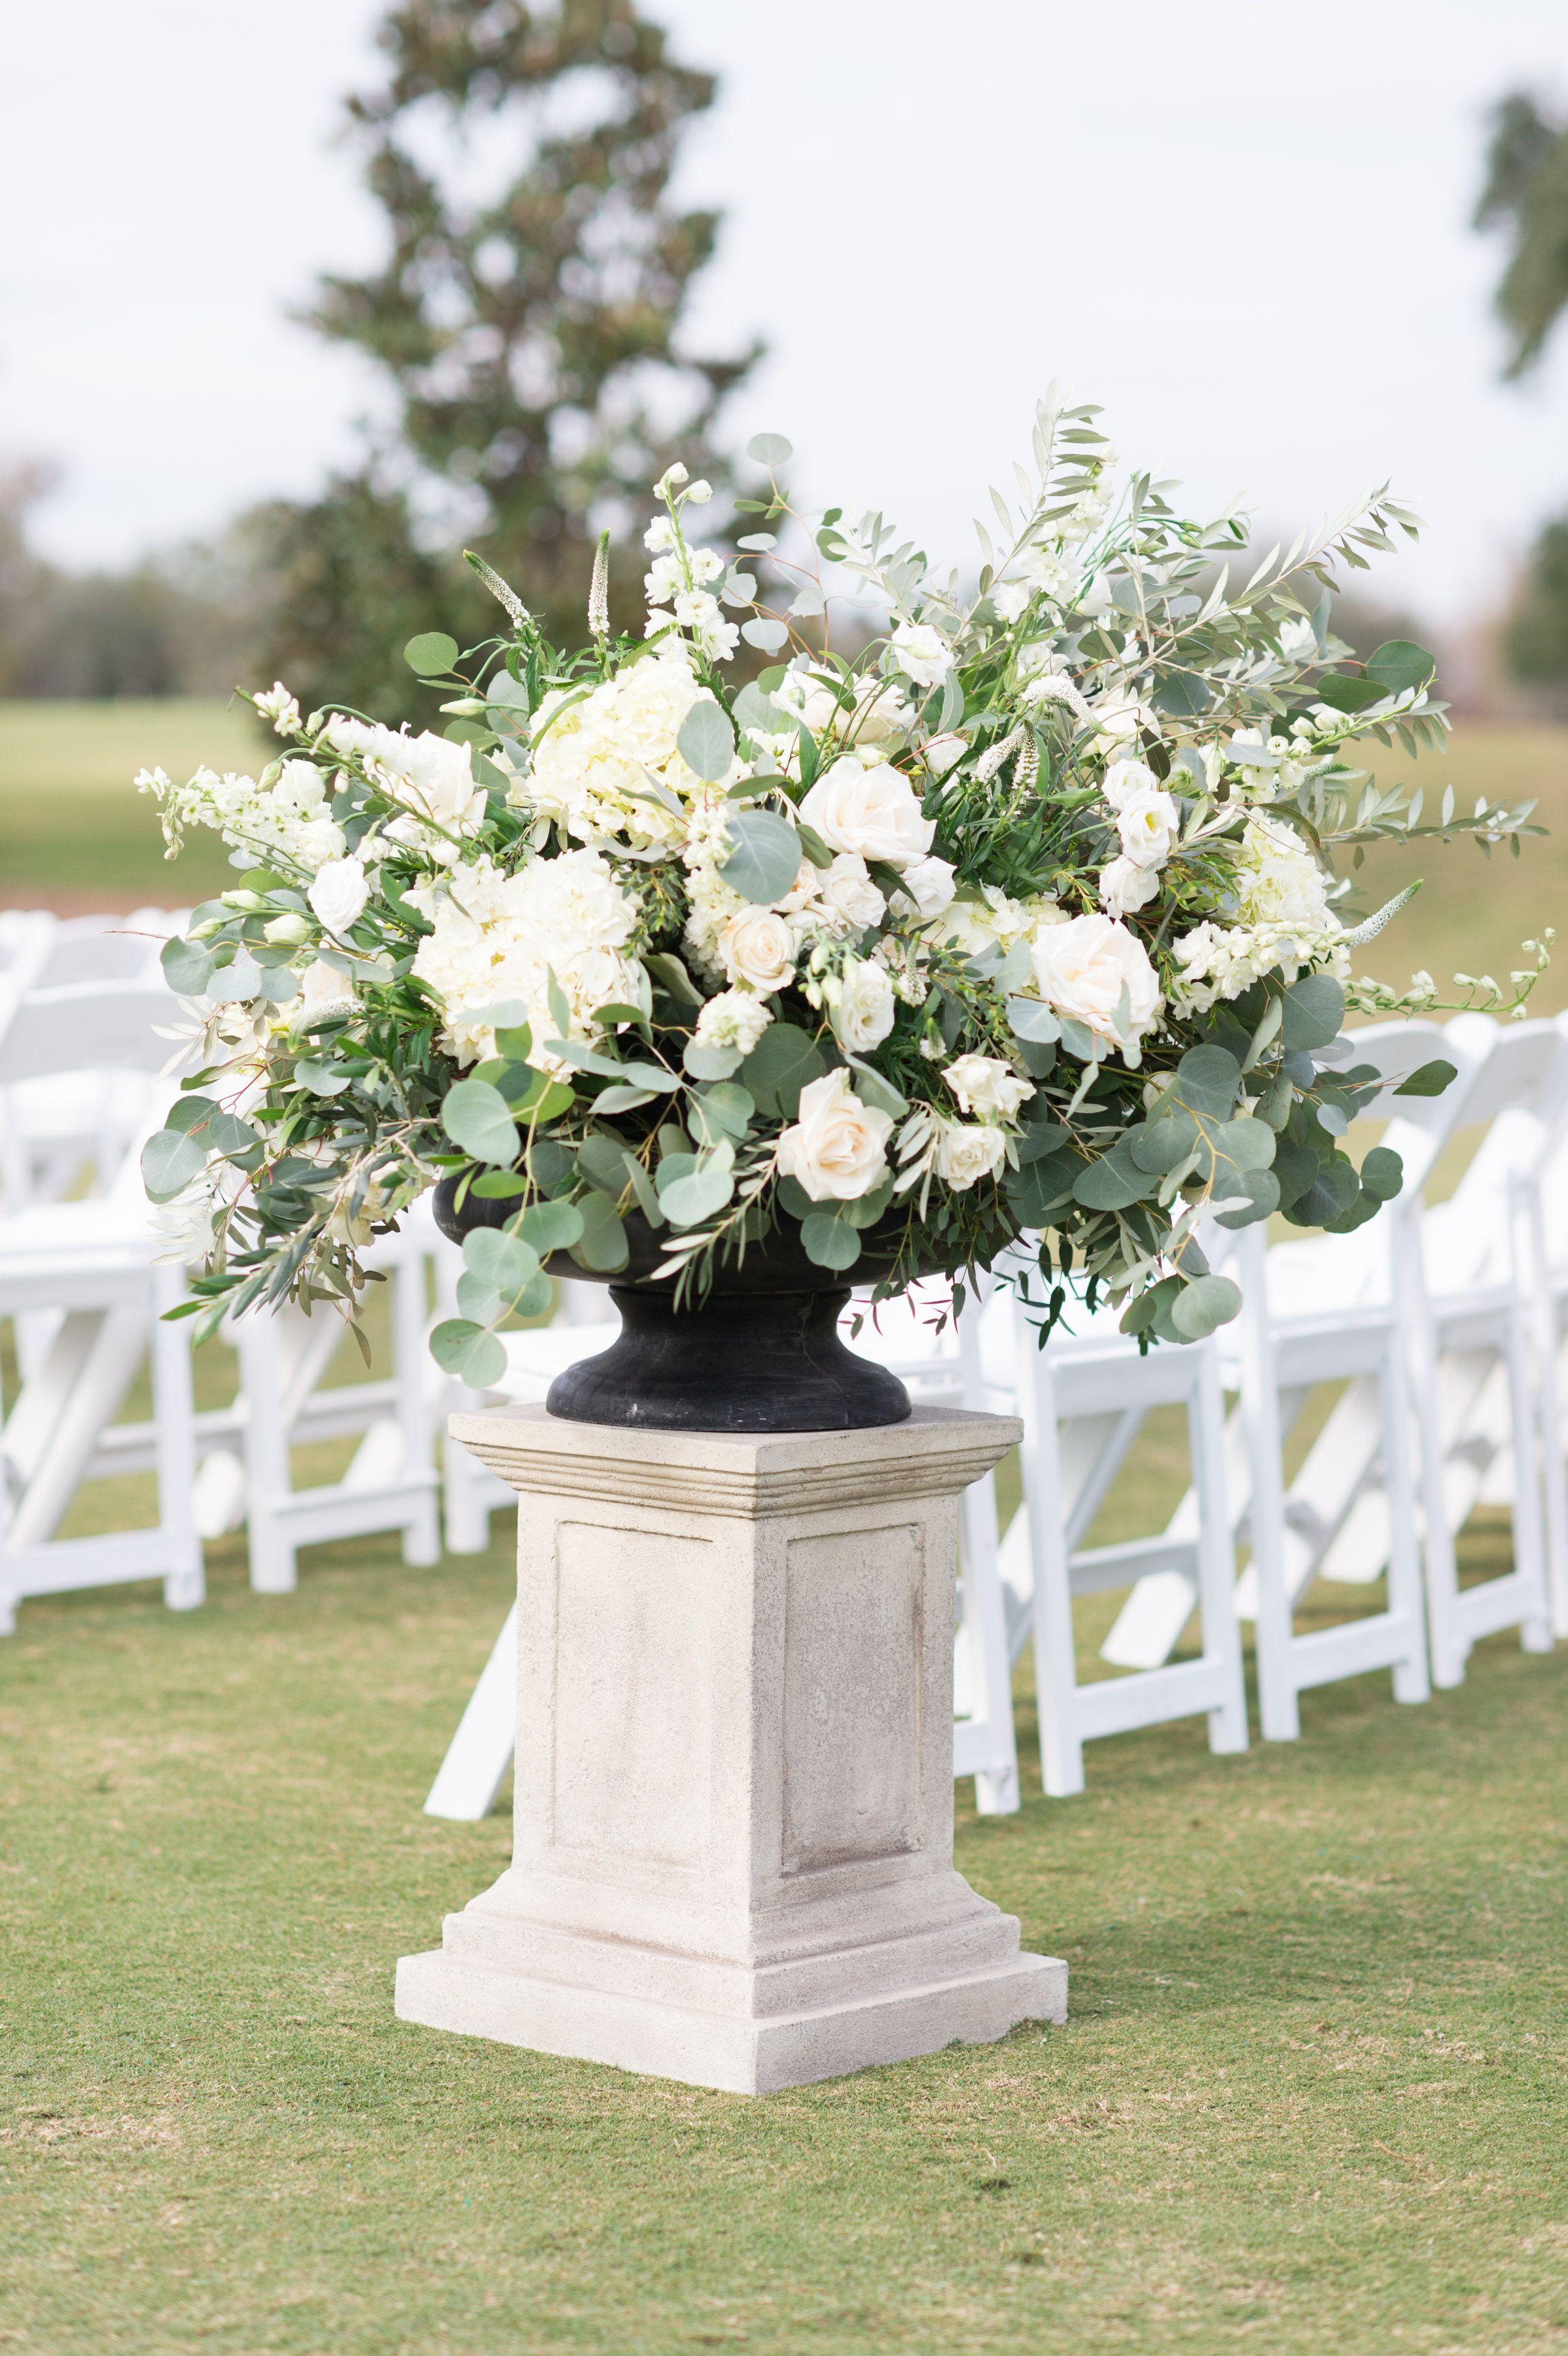 Large Outdoor Wedding Arrangement Of White Hydrangea White Lisianthus White Majo Outdoor Wedding Flowers Eucalyptus Wedding Decor Wedding Floral Centerpieces